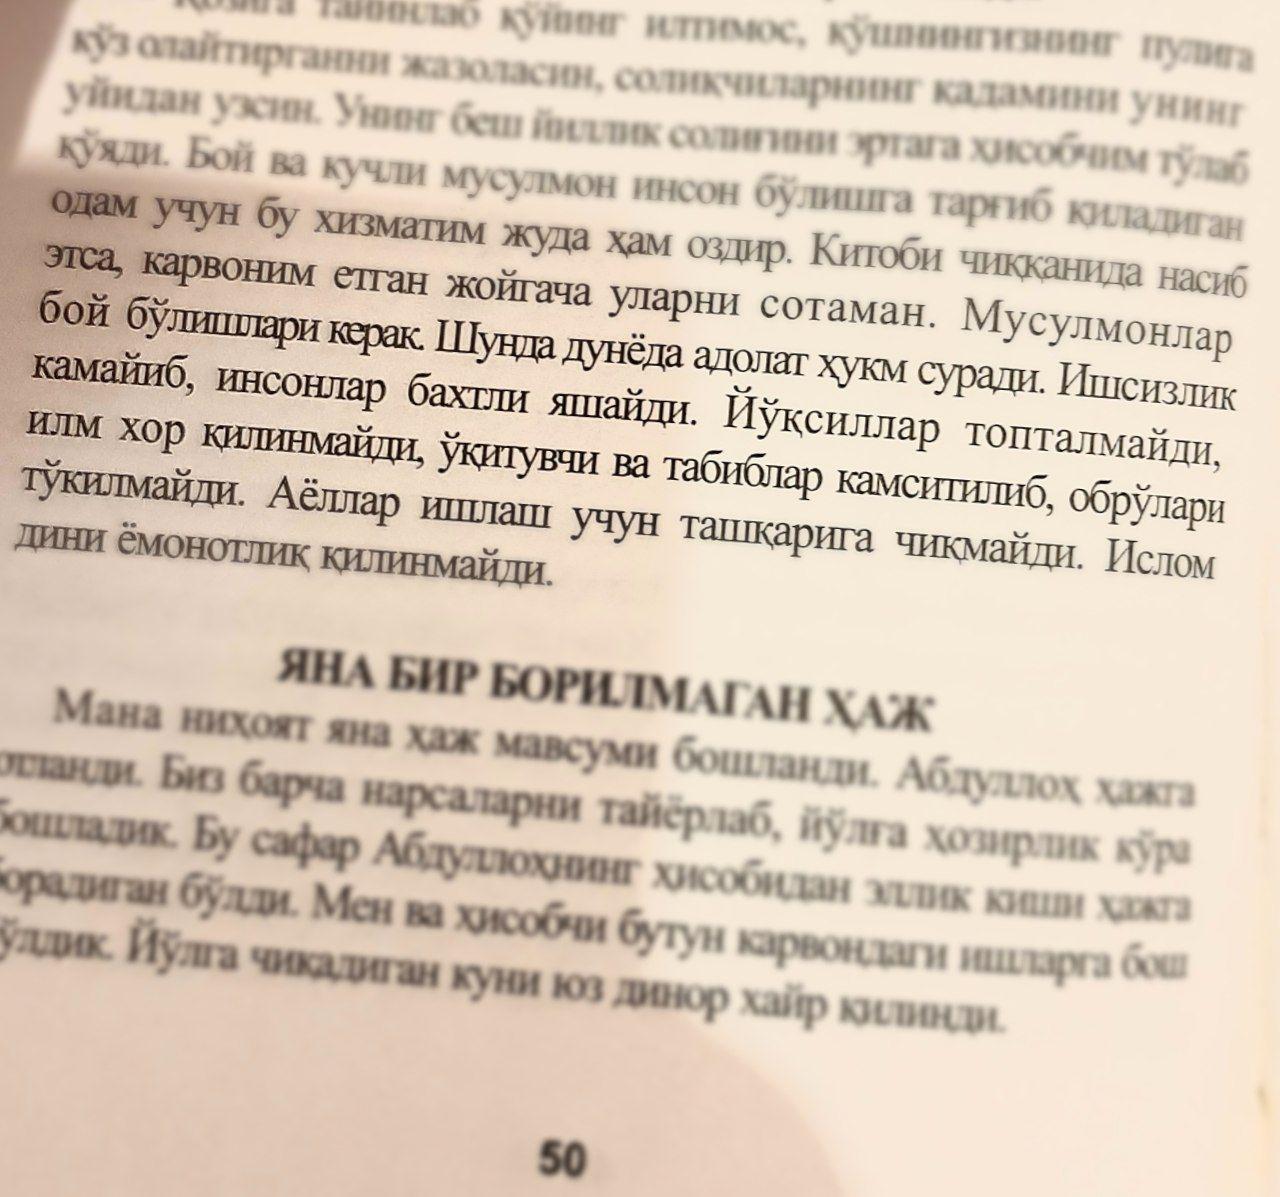 Oila pdf baxtiyor kitobi 65. китоби